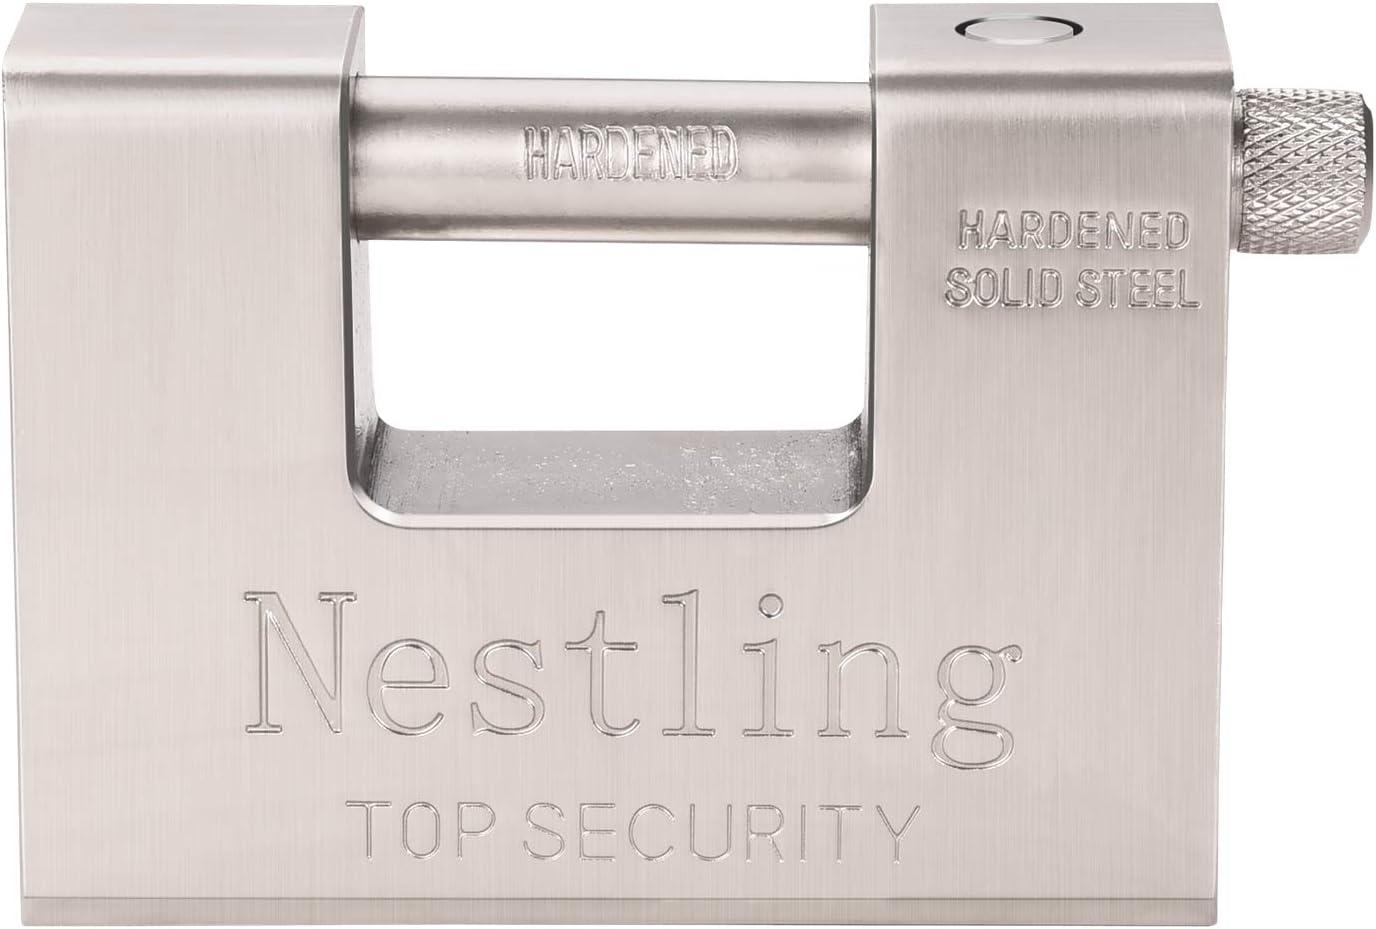 Nestling 5 Llaves 1.1 KG Rectangular Súper Resistente 20 '40' Contenedor Garaje Garaje Persiana Cadena Candado 94 mm Trabajo Pesado Alta Seguridad